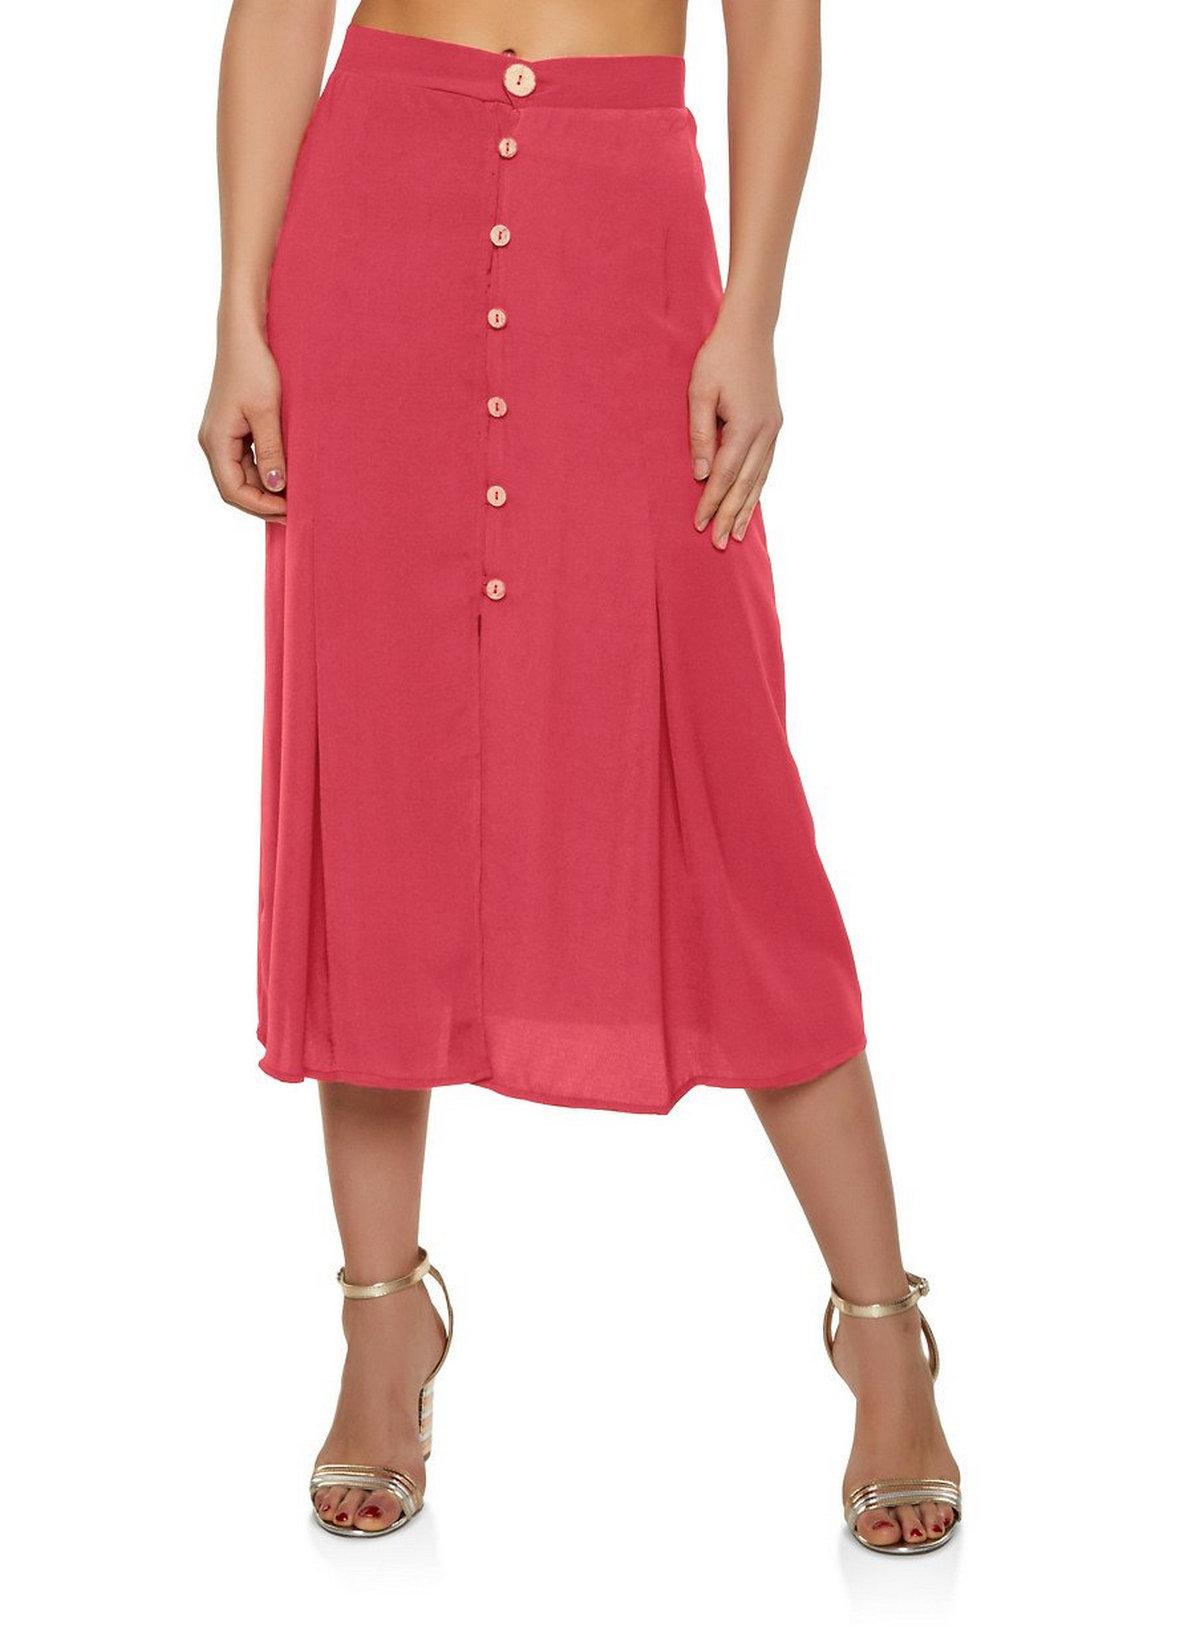 A-Line Below Knee Skirt in Vinyl Hot Pink